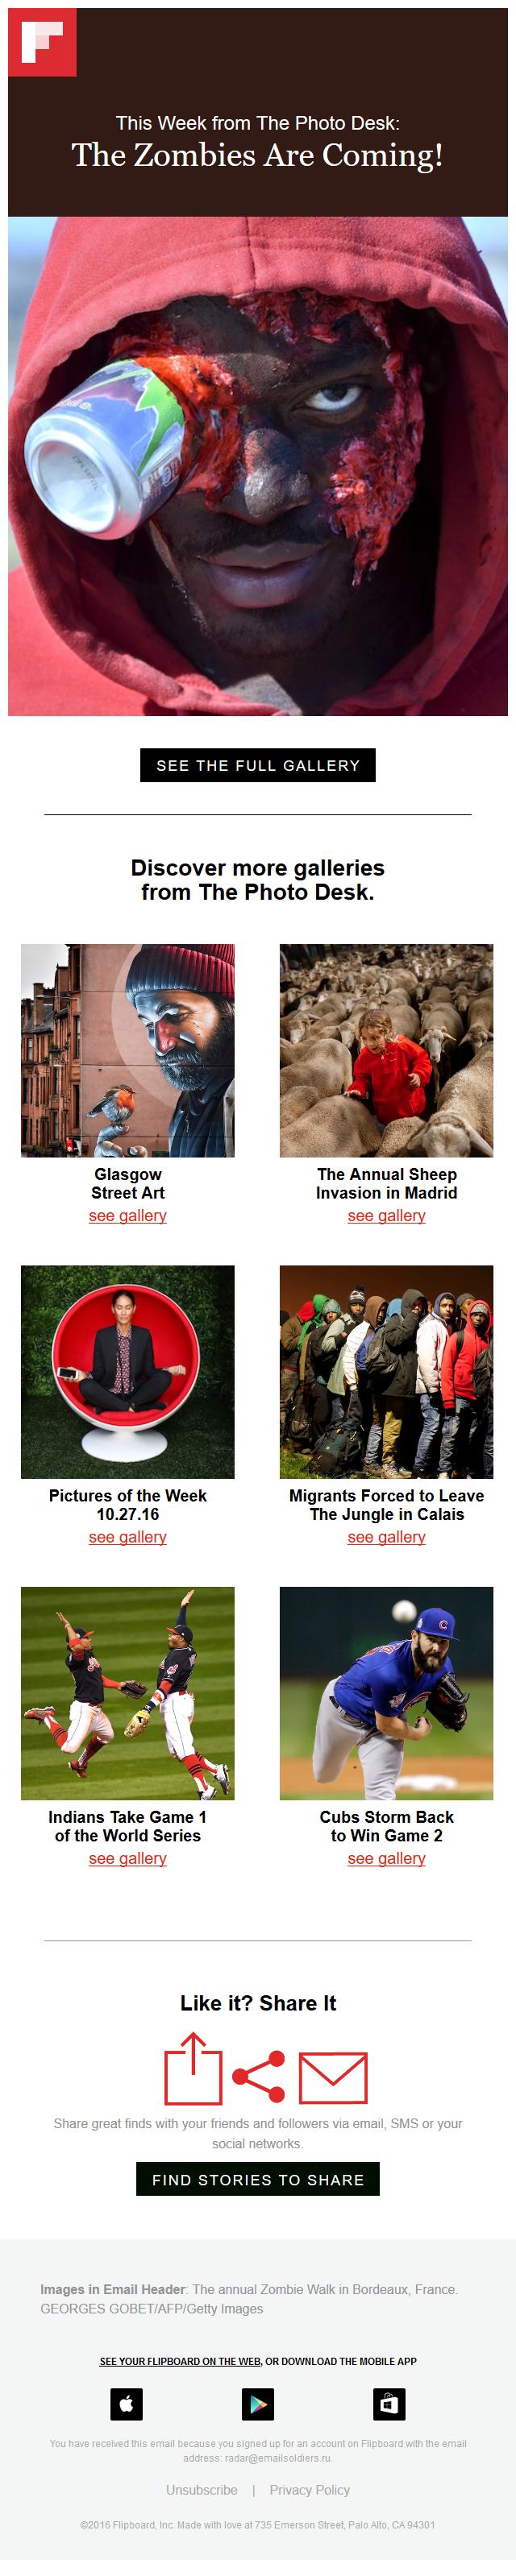 Flipboard - This Week in Photos: Zombie apocalypse is here